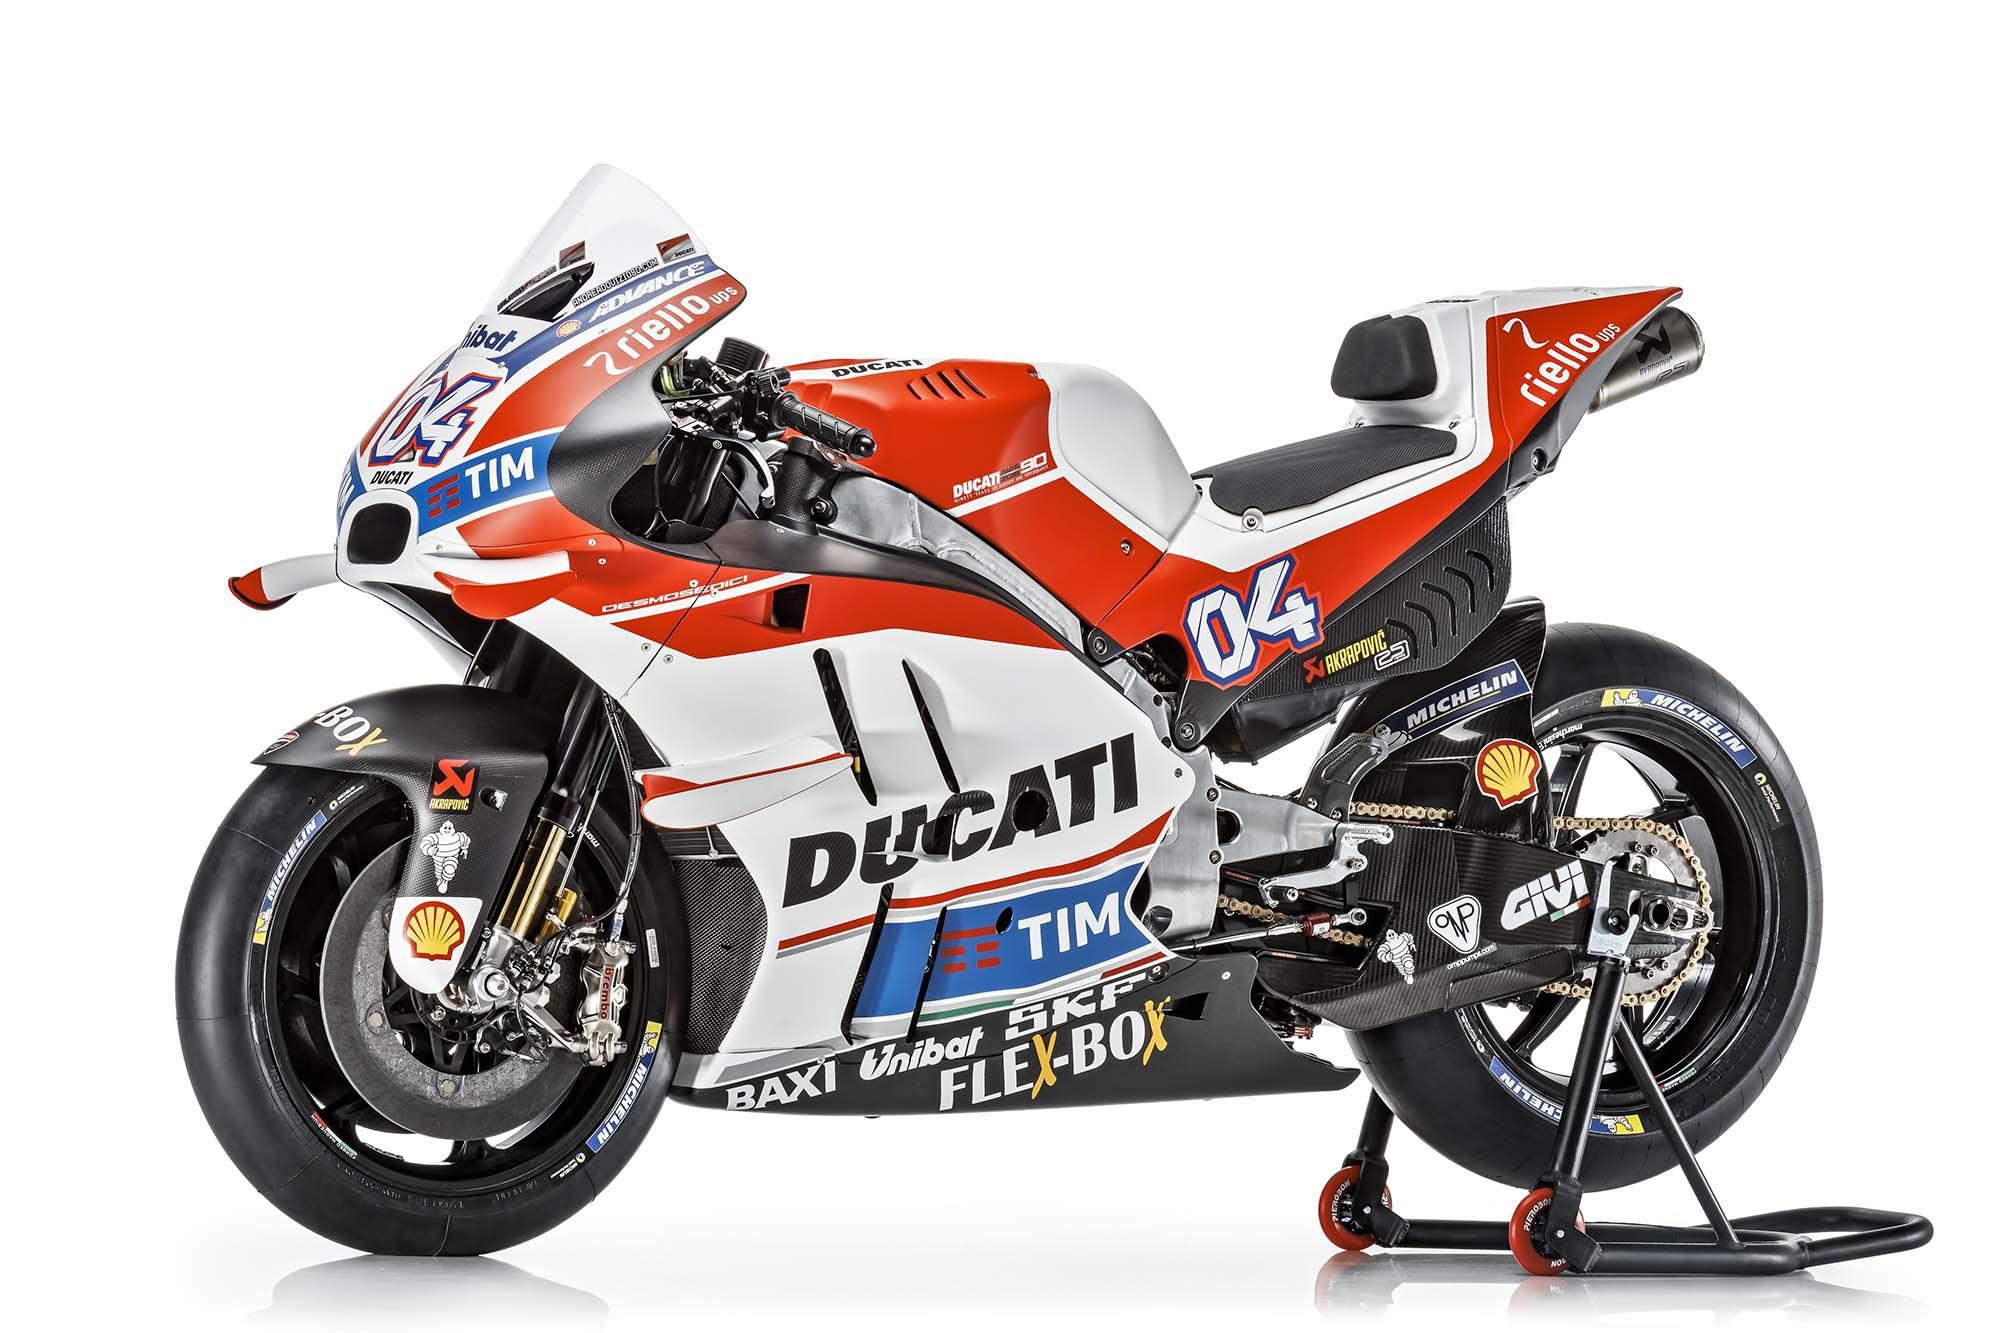 2016 Ducati Desmosedici GP photo gallery ‒ spread the wings   DriveMag Riders